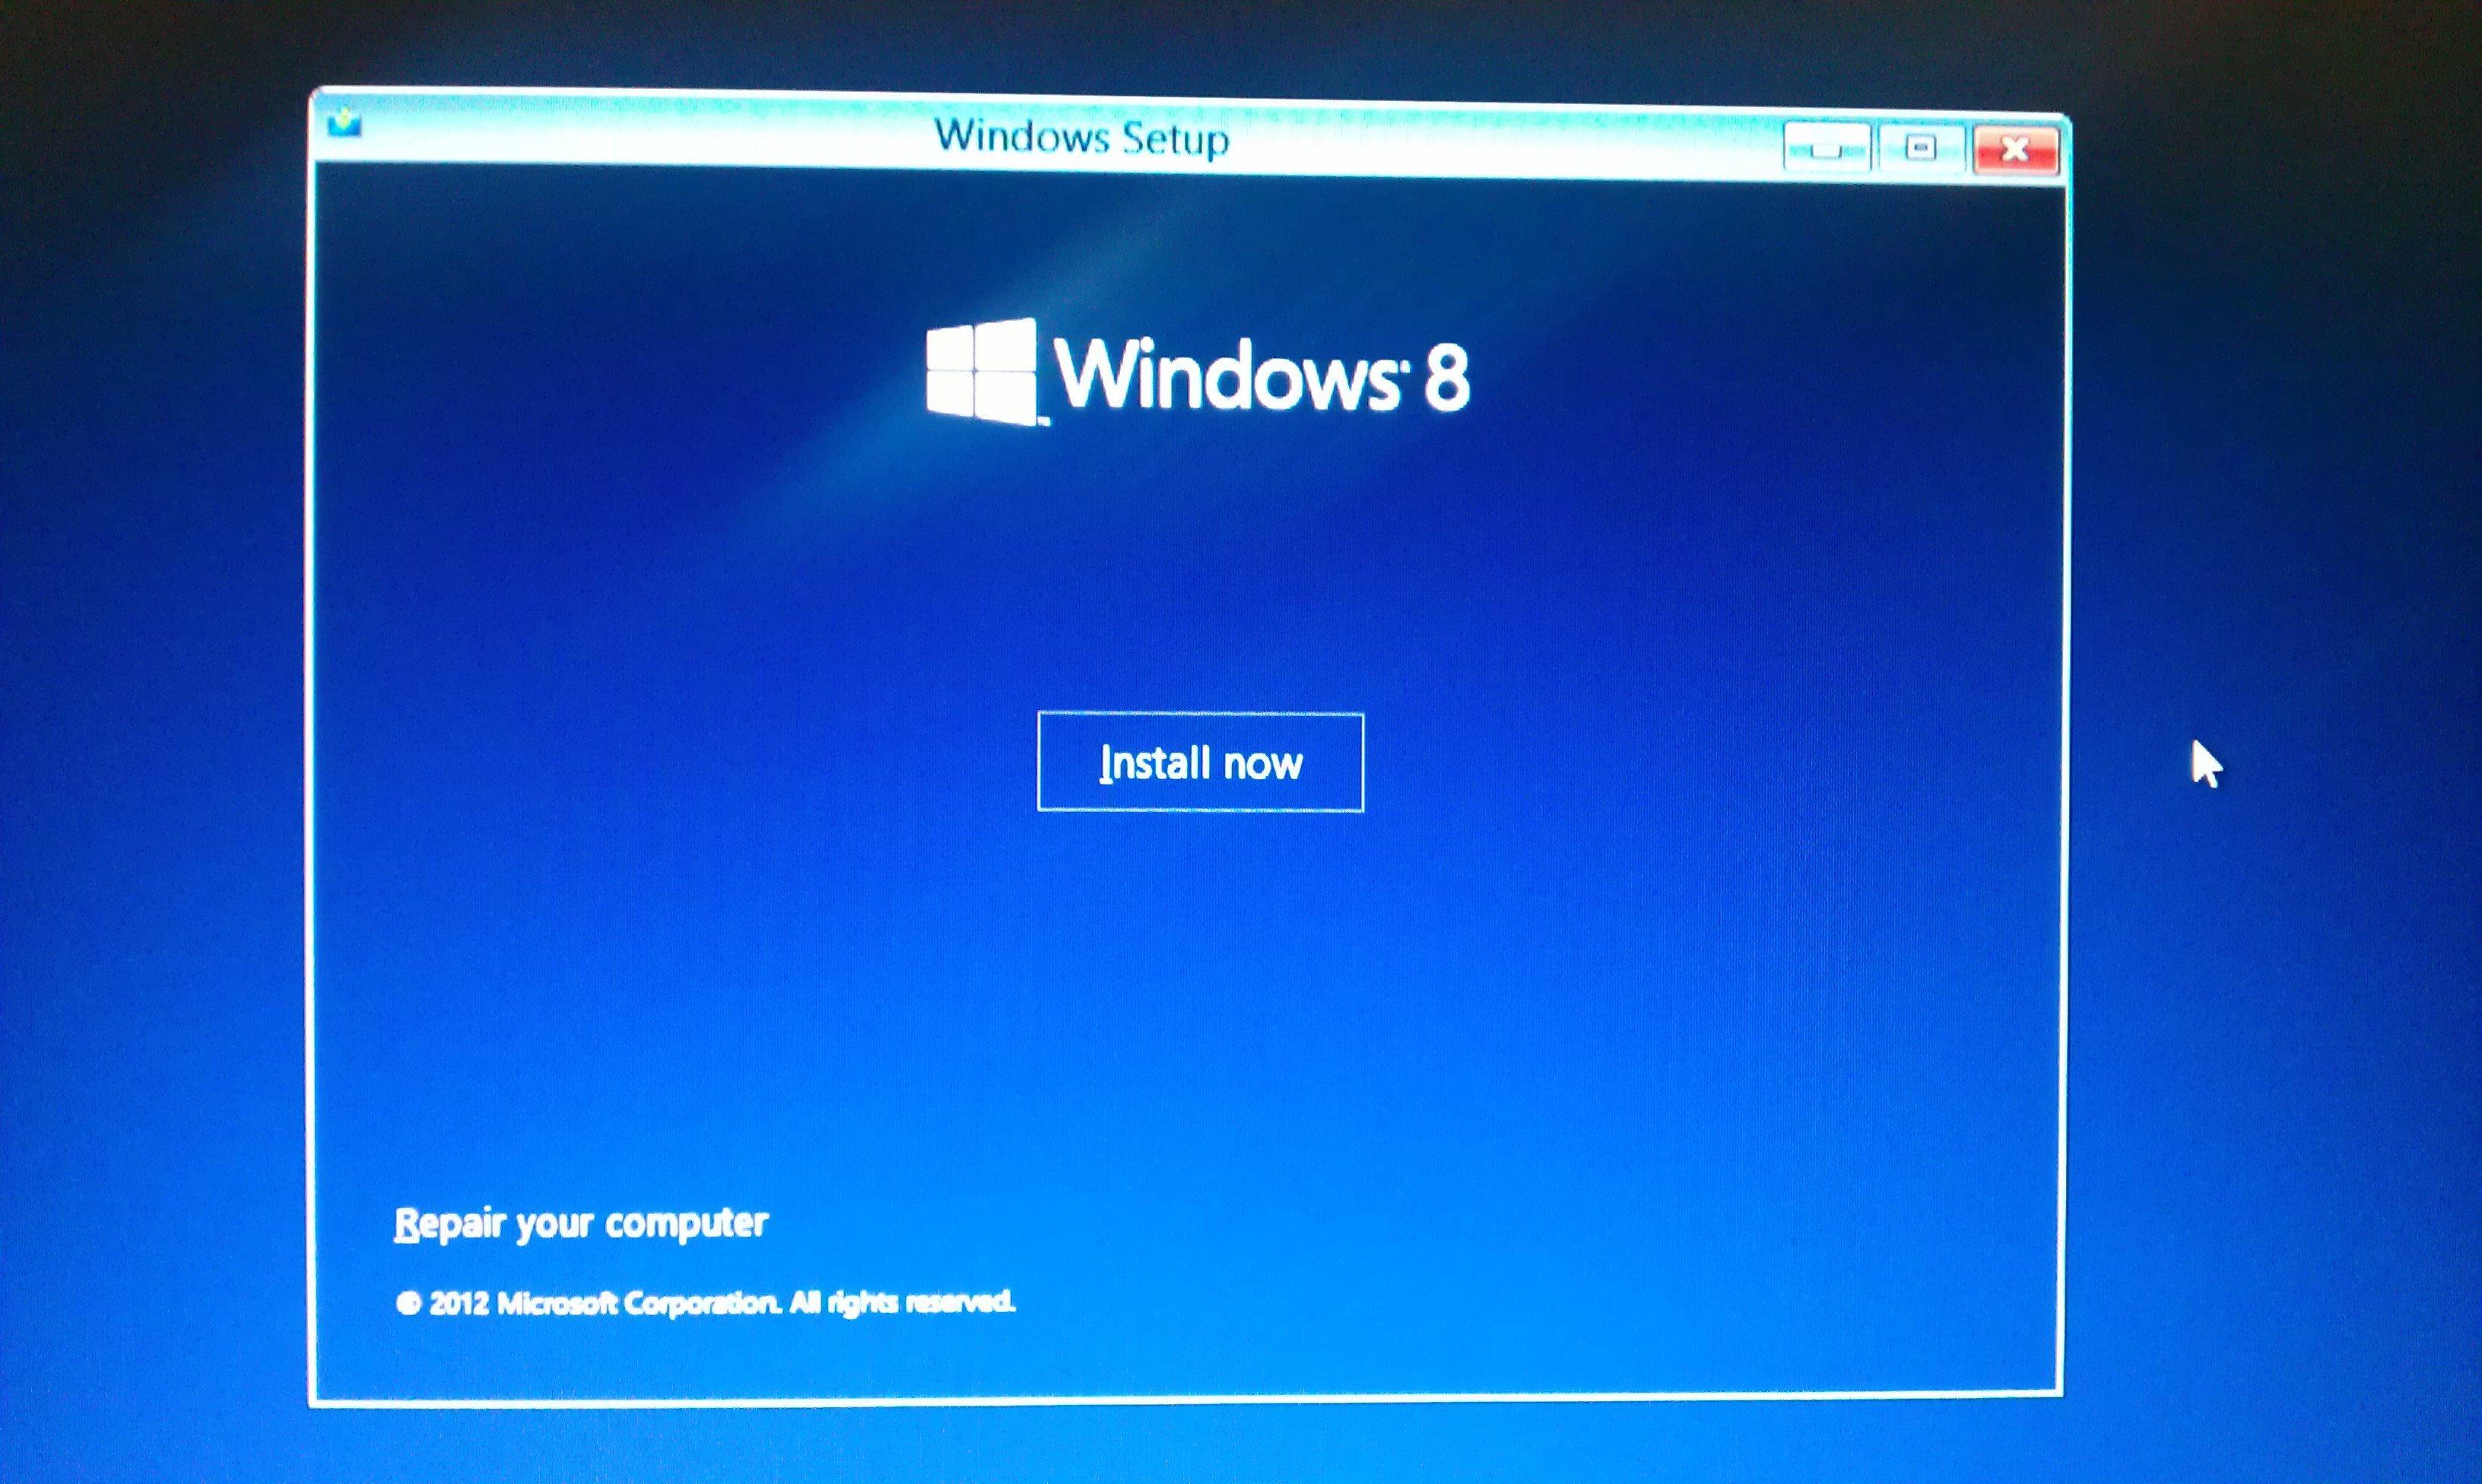 Windows 8 computer - Windows 8 Computer 50